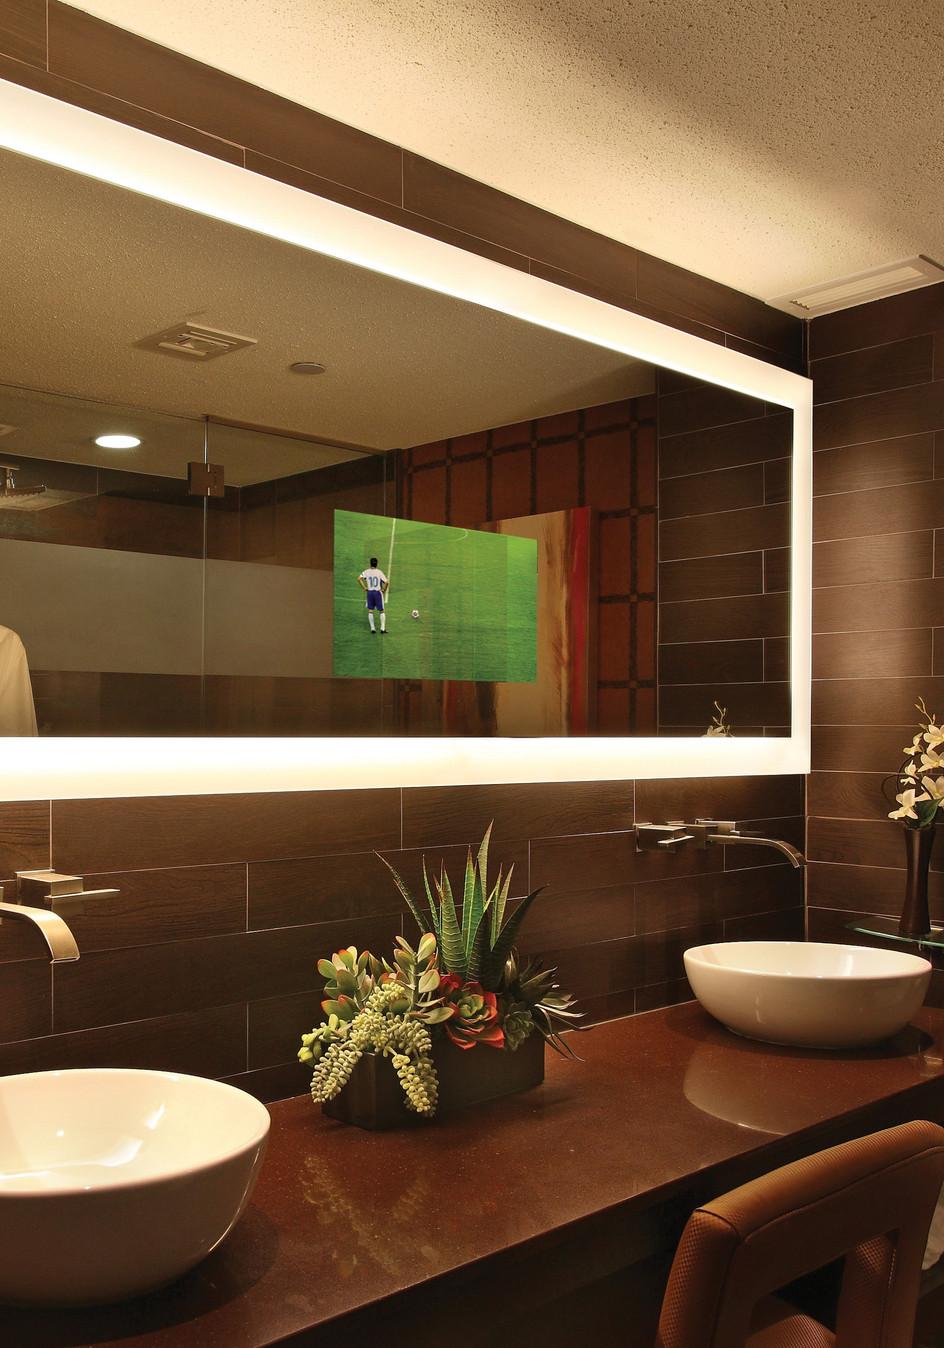 Silhouette-Mirror-TV